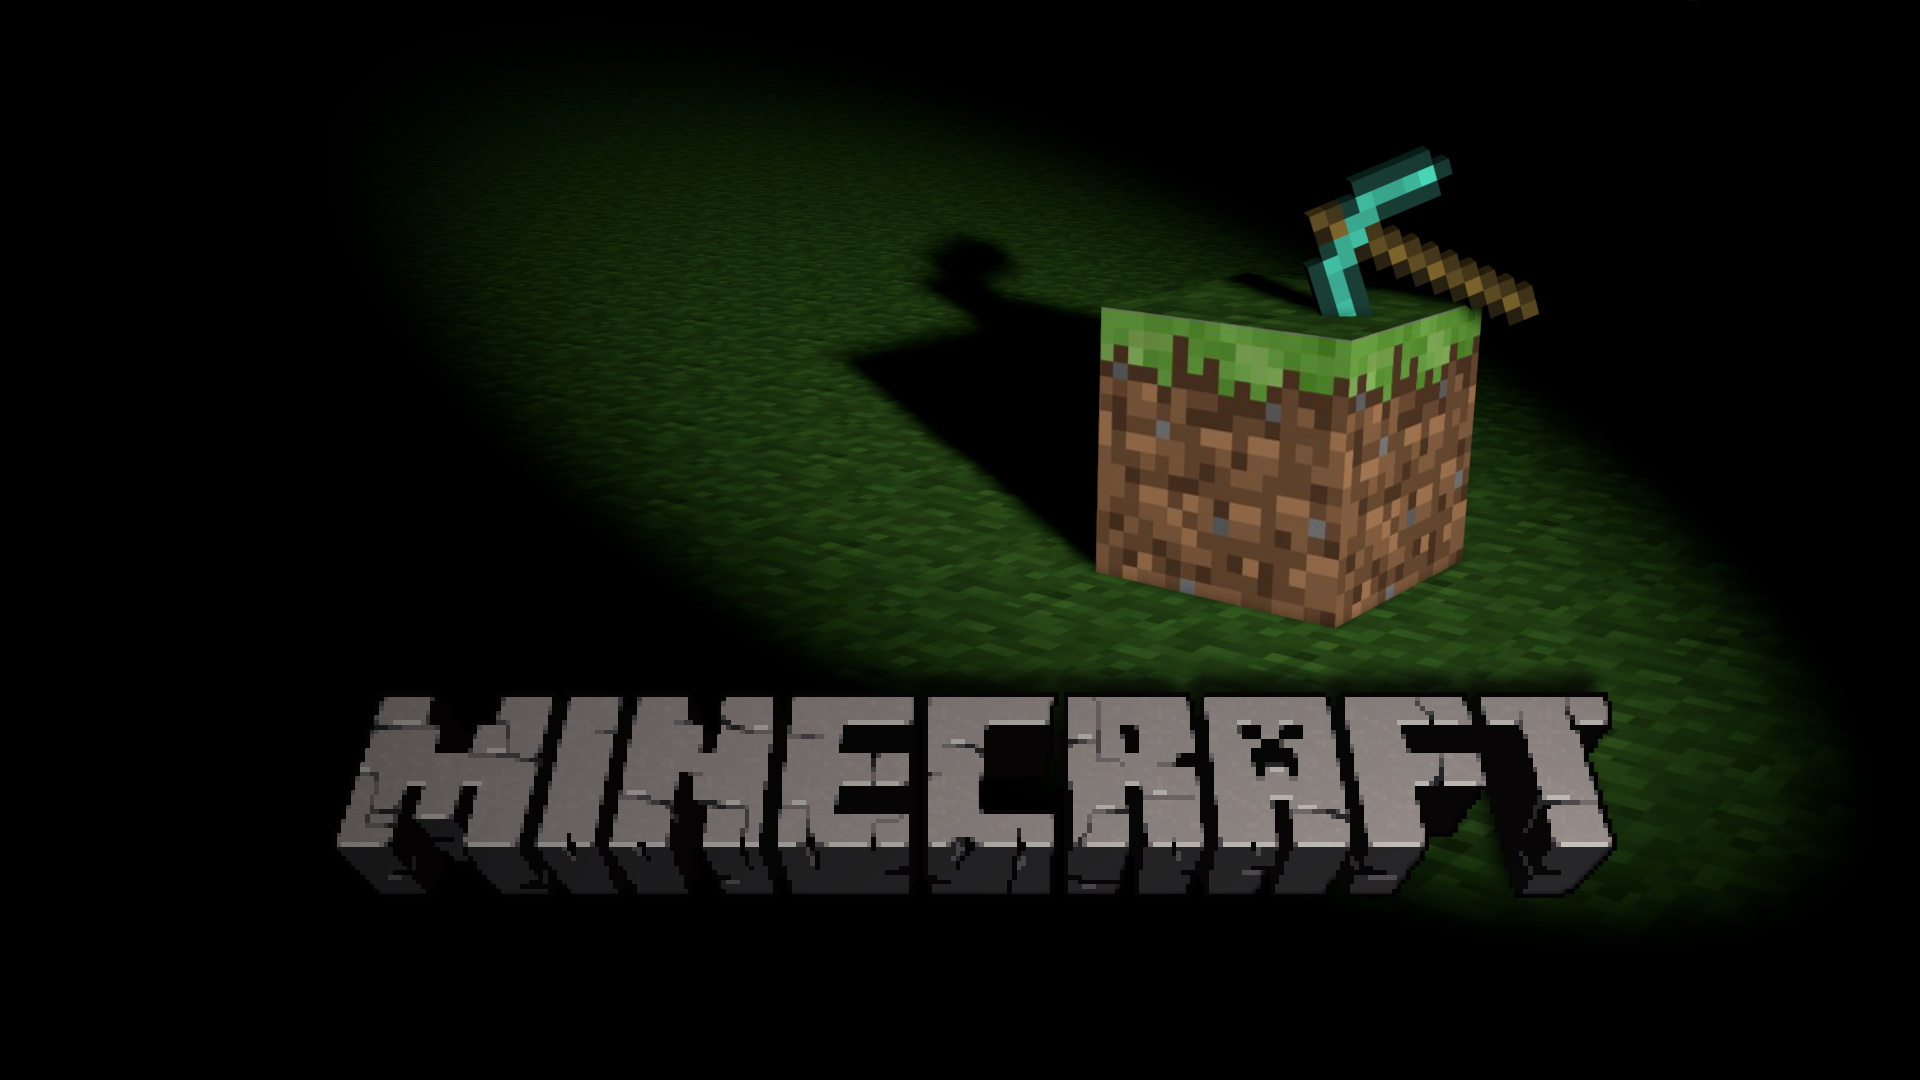 New 3d Wallpaper For Pc Minecraft Wallpapers Hd Free Download Pixelstalk Net